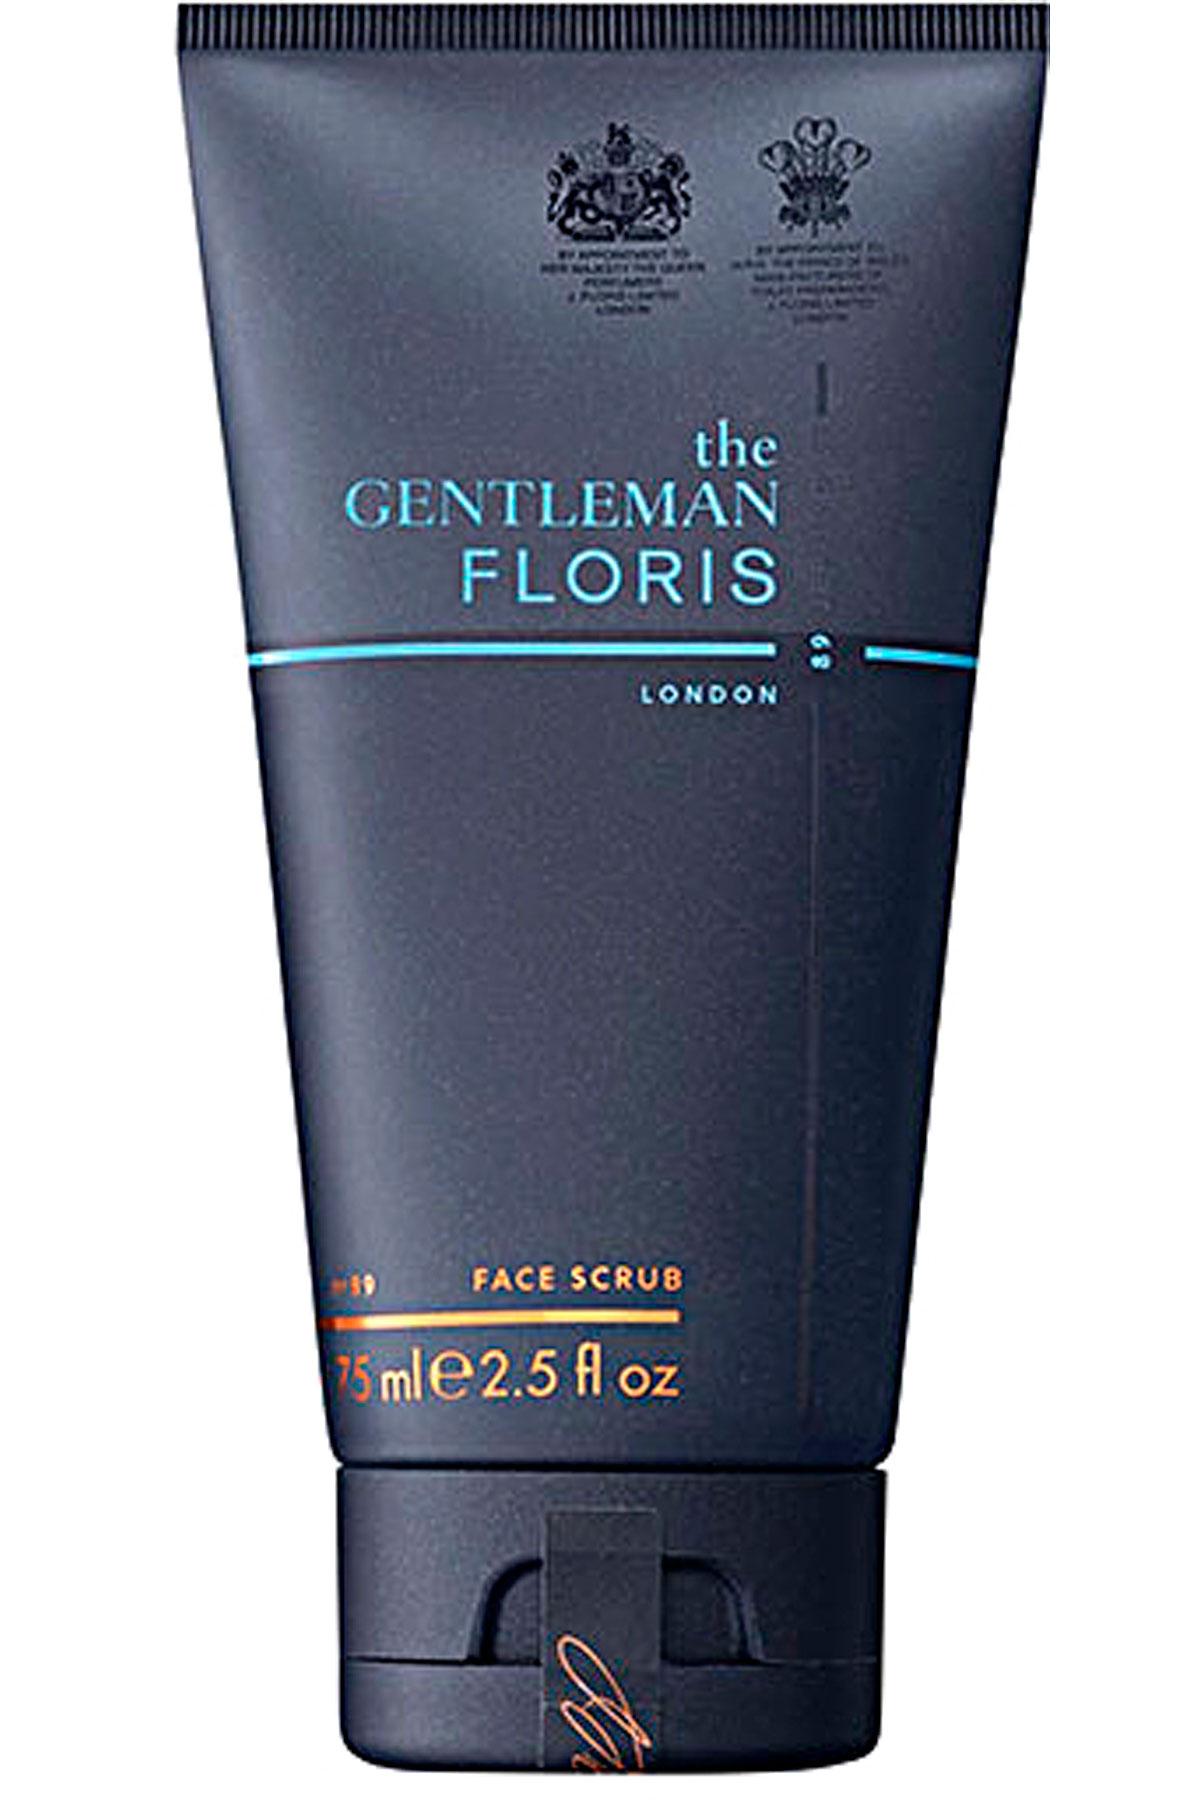 Floris London Beauty for Men On Sale, No. 89 - Face Scrub - 75 Ml, 2019, 75 ml